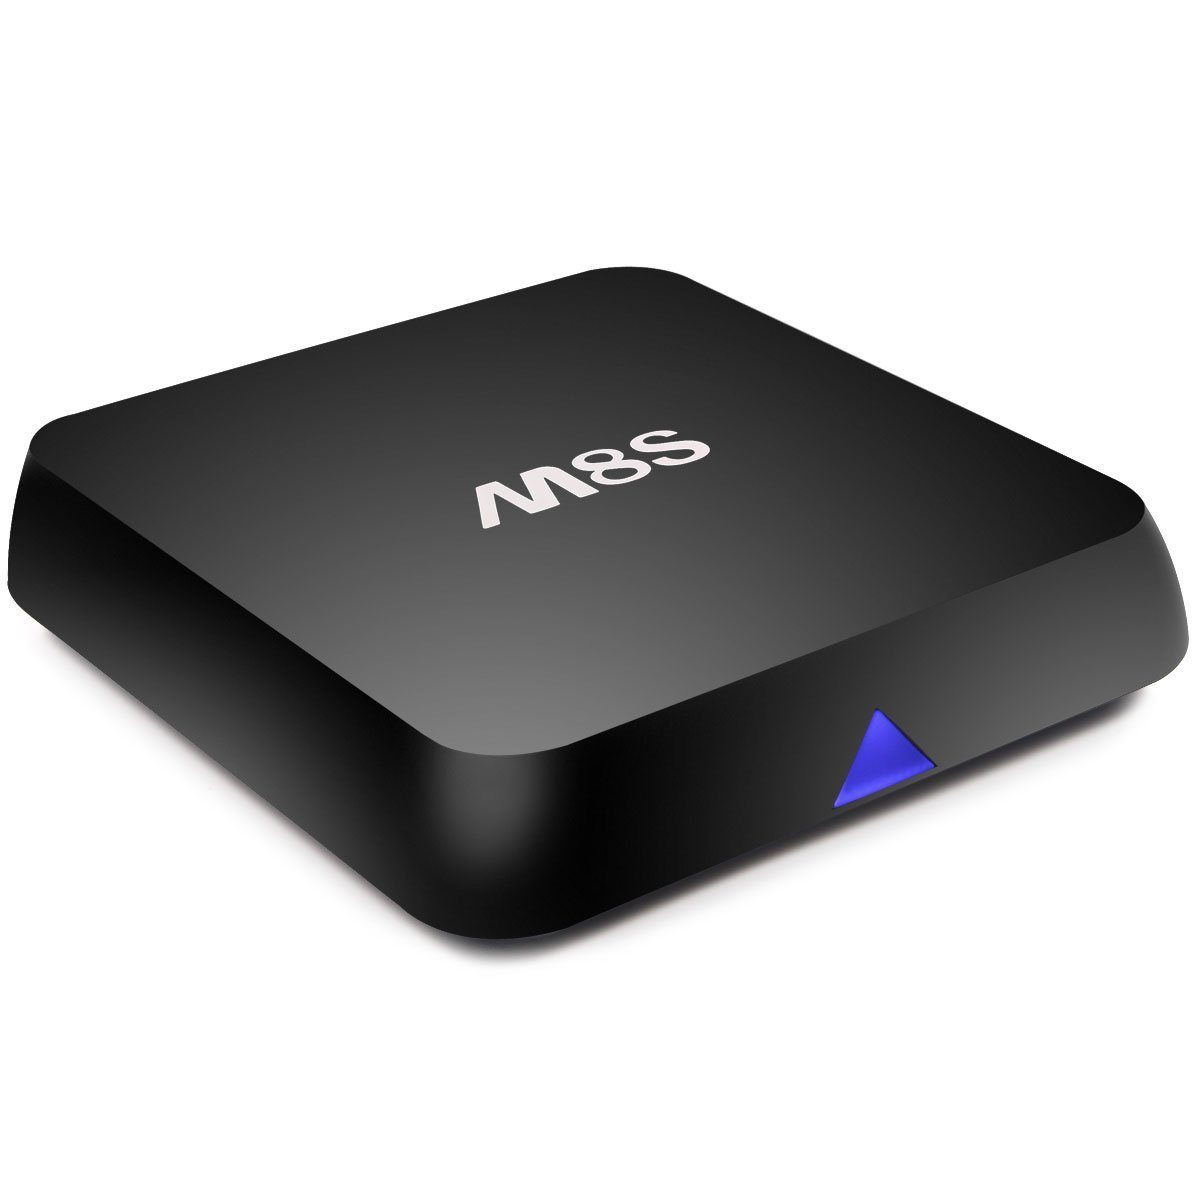 Factory Wholesale M8s Arabic IPTV Box Streaming Box Android TV Box